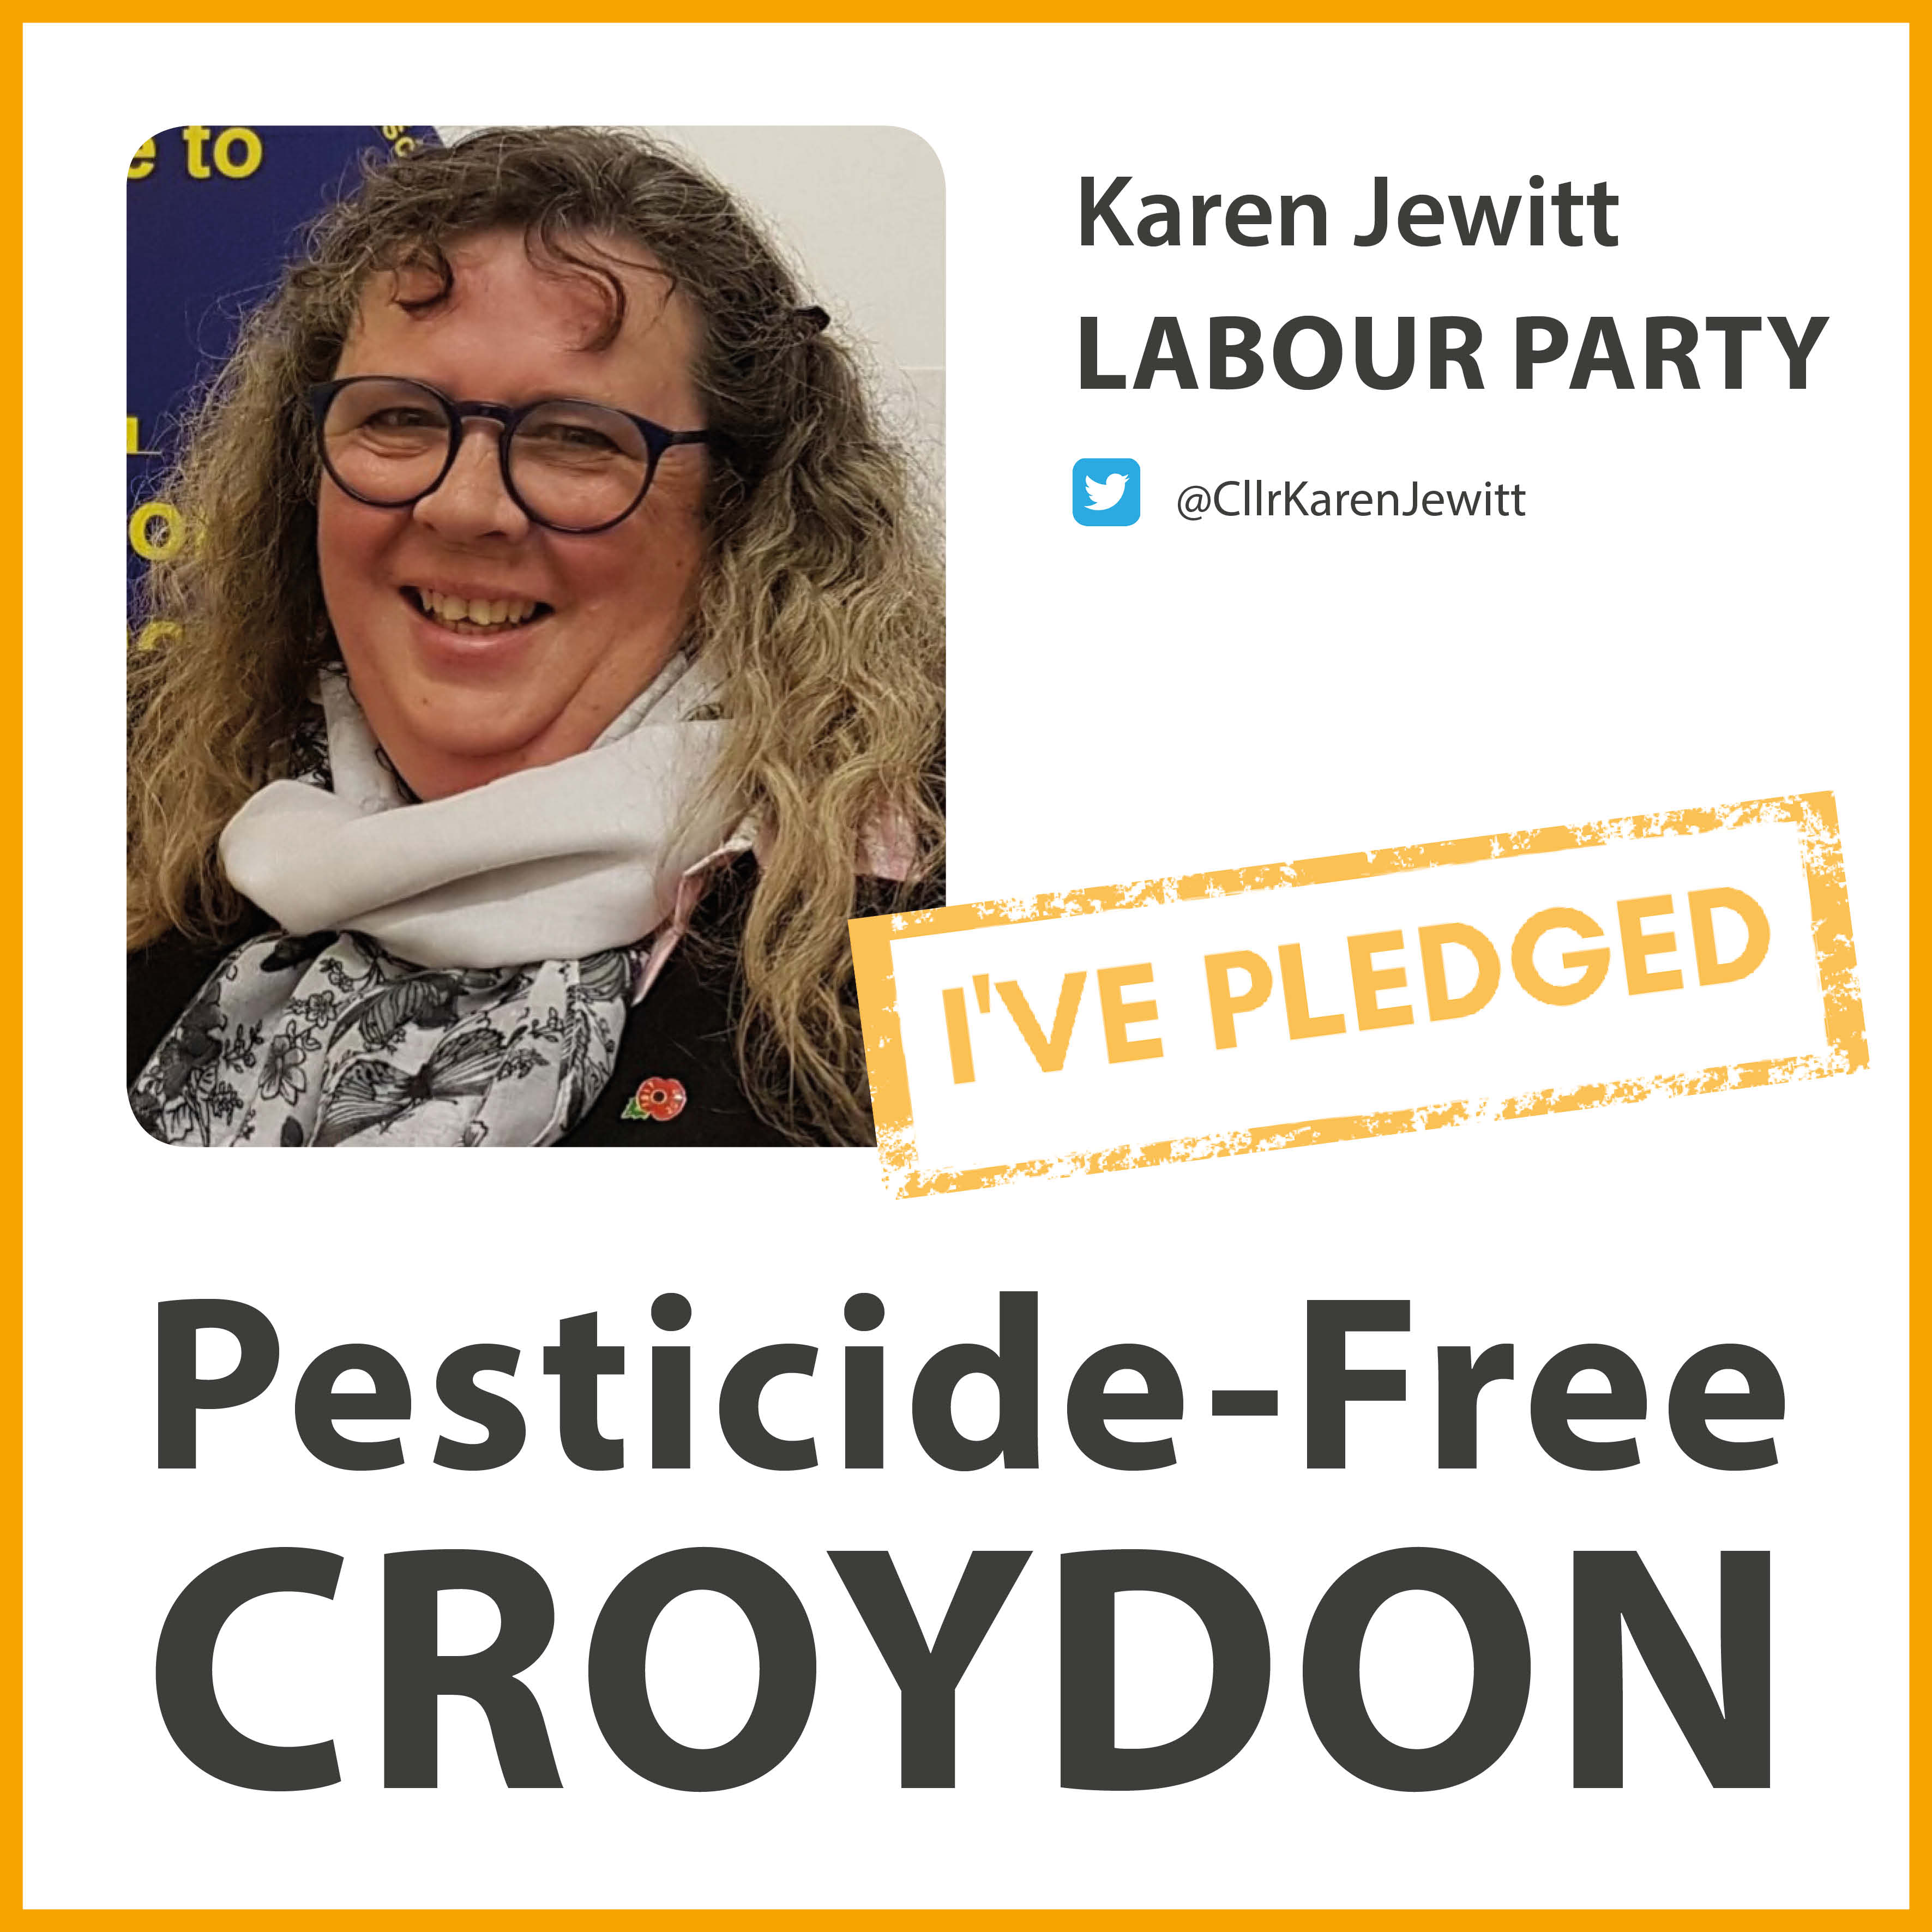 Karen Jewitt has taken the pesticide-free pledge in Croydon